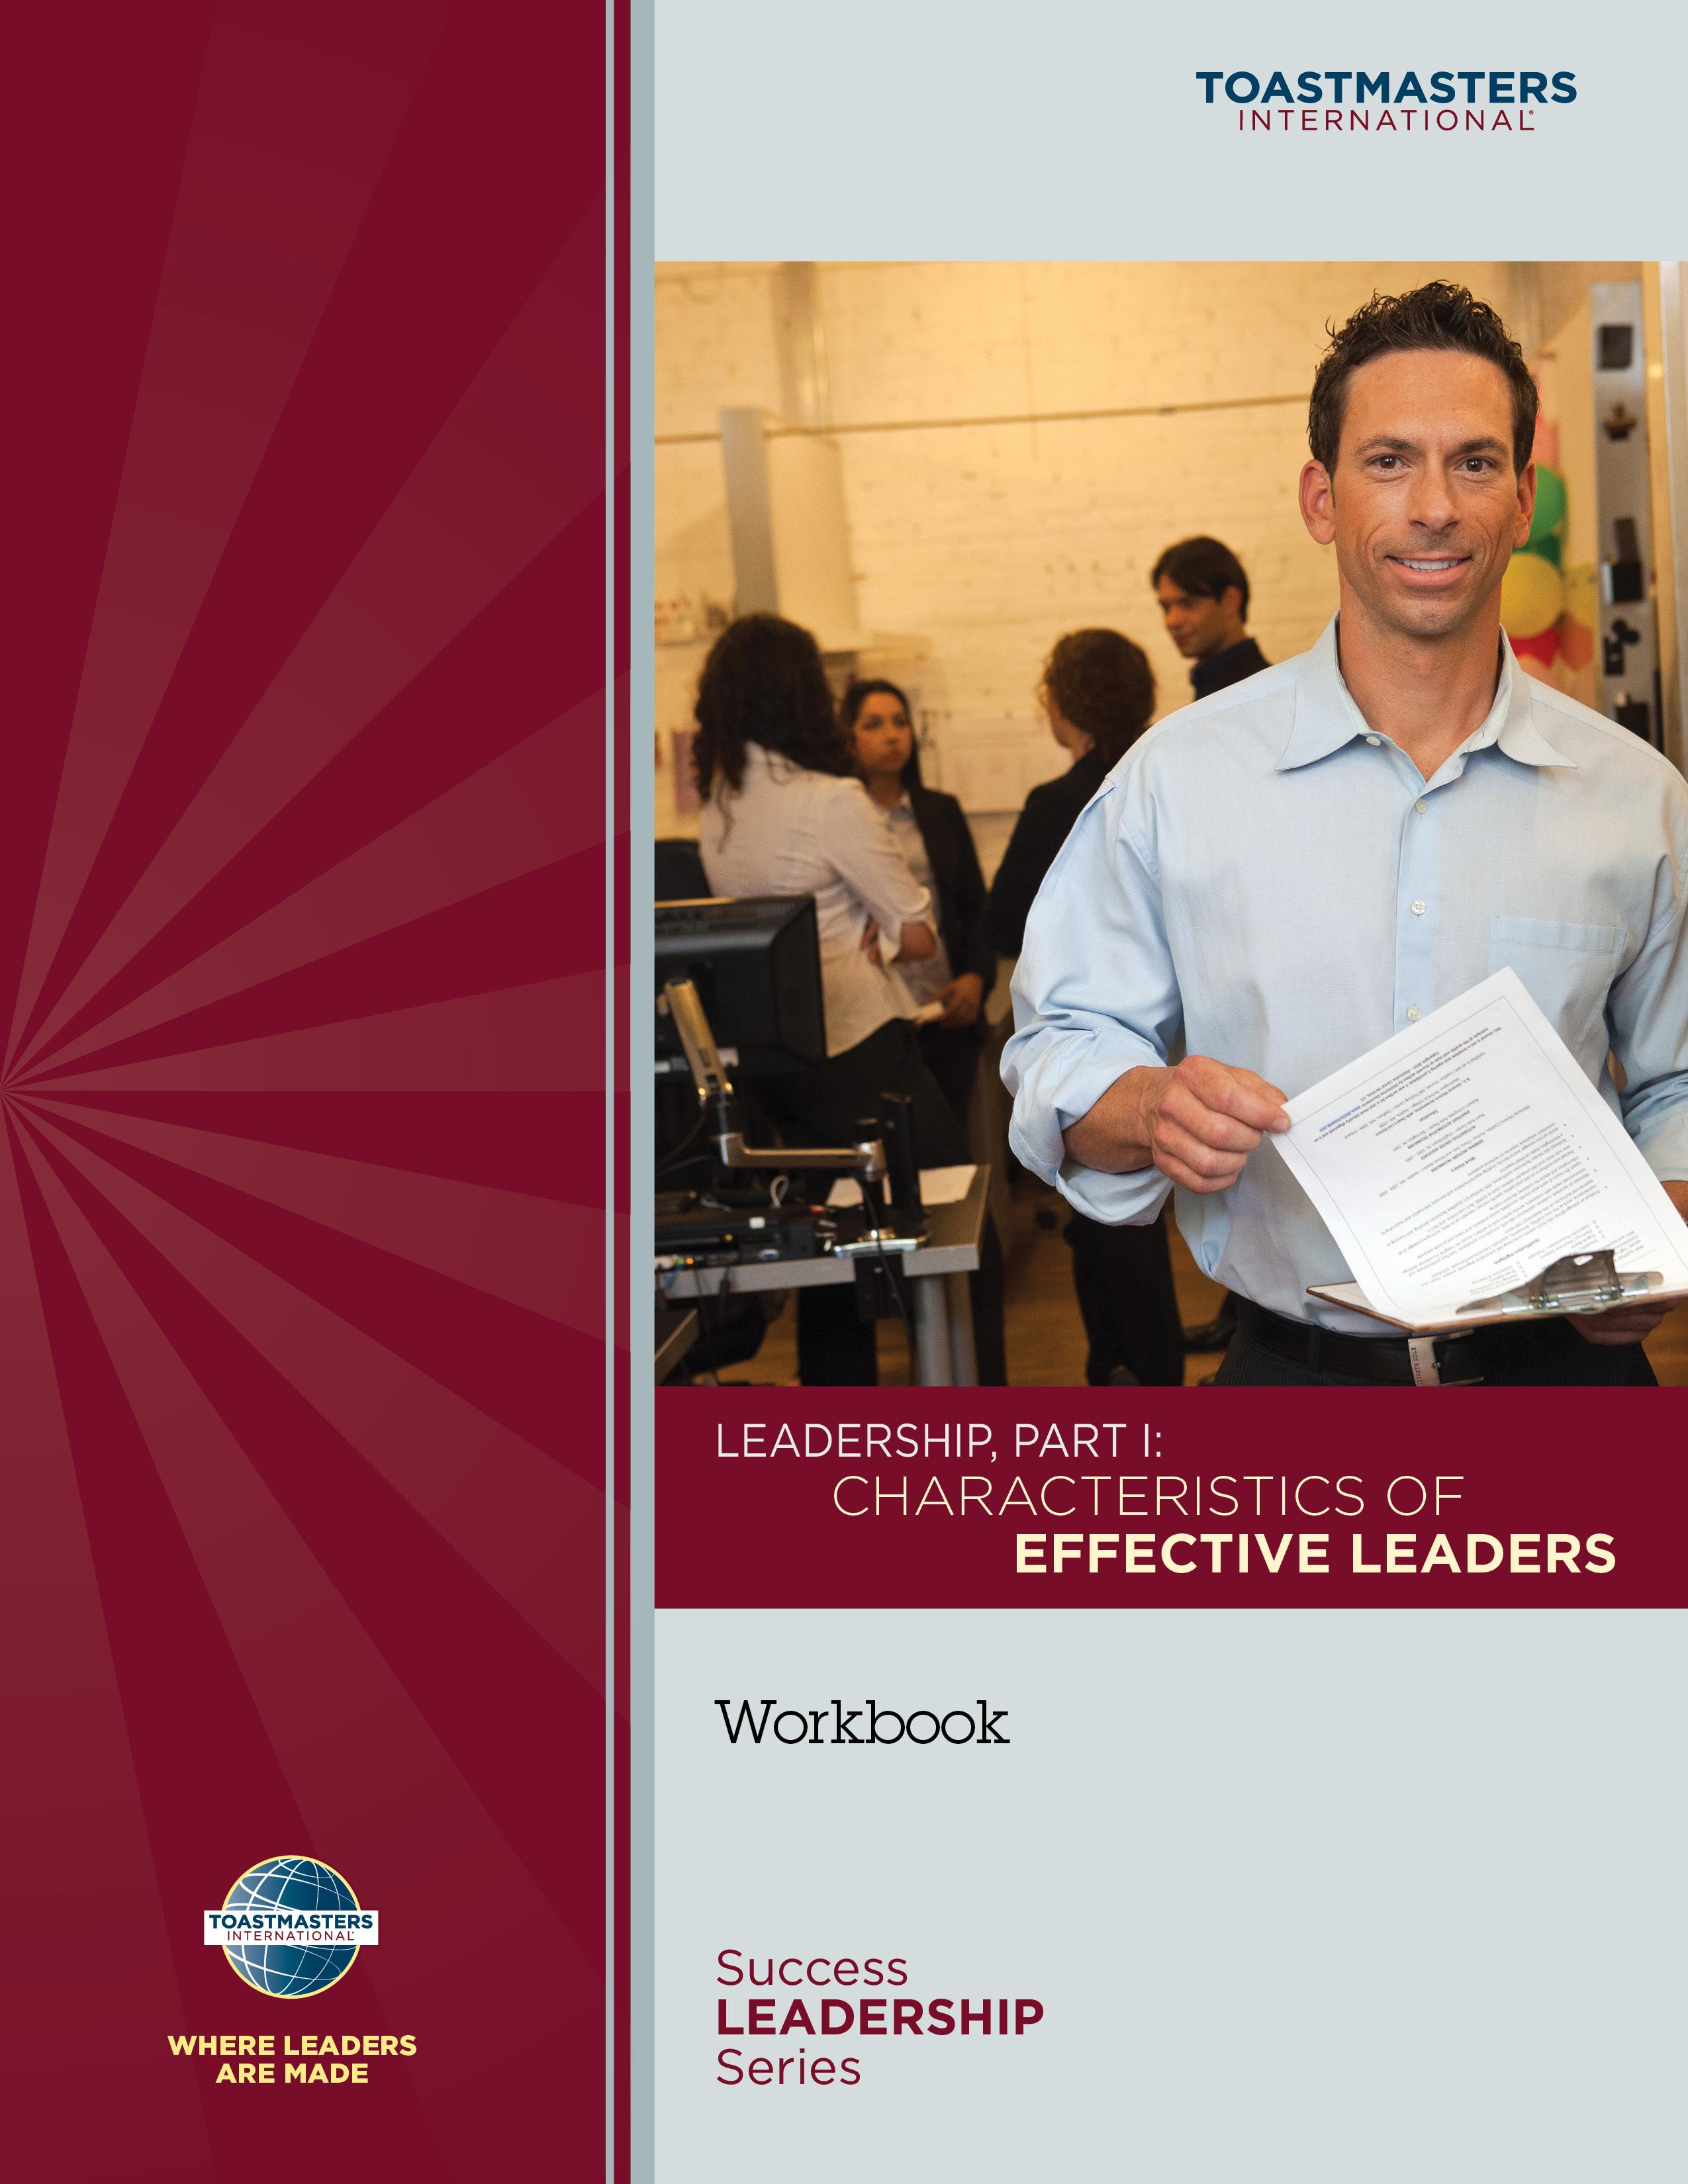 Leadership, Part I: Characteristics of Effective Leaders Workbook